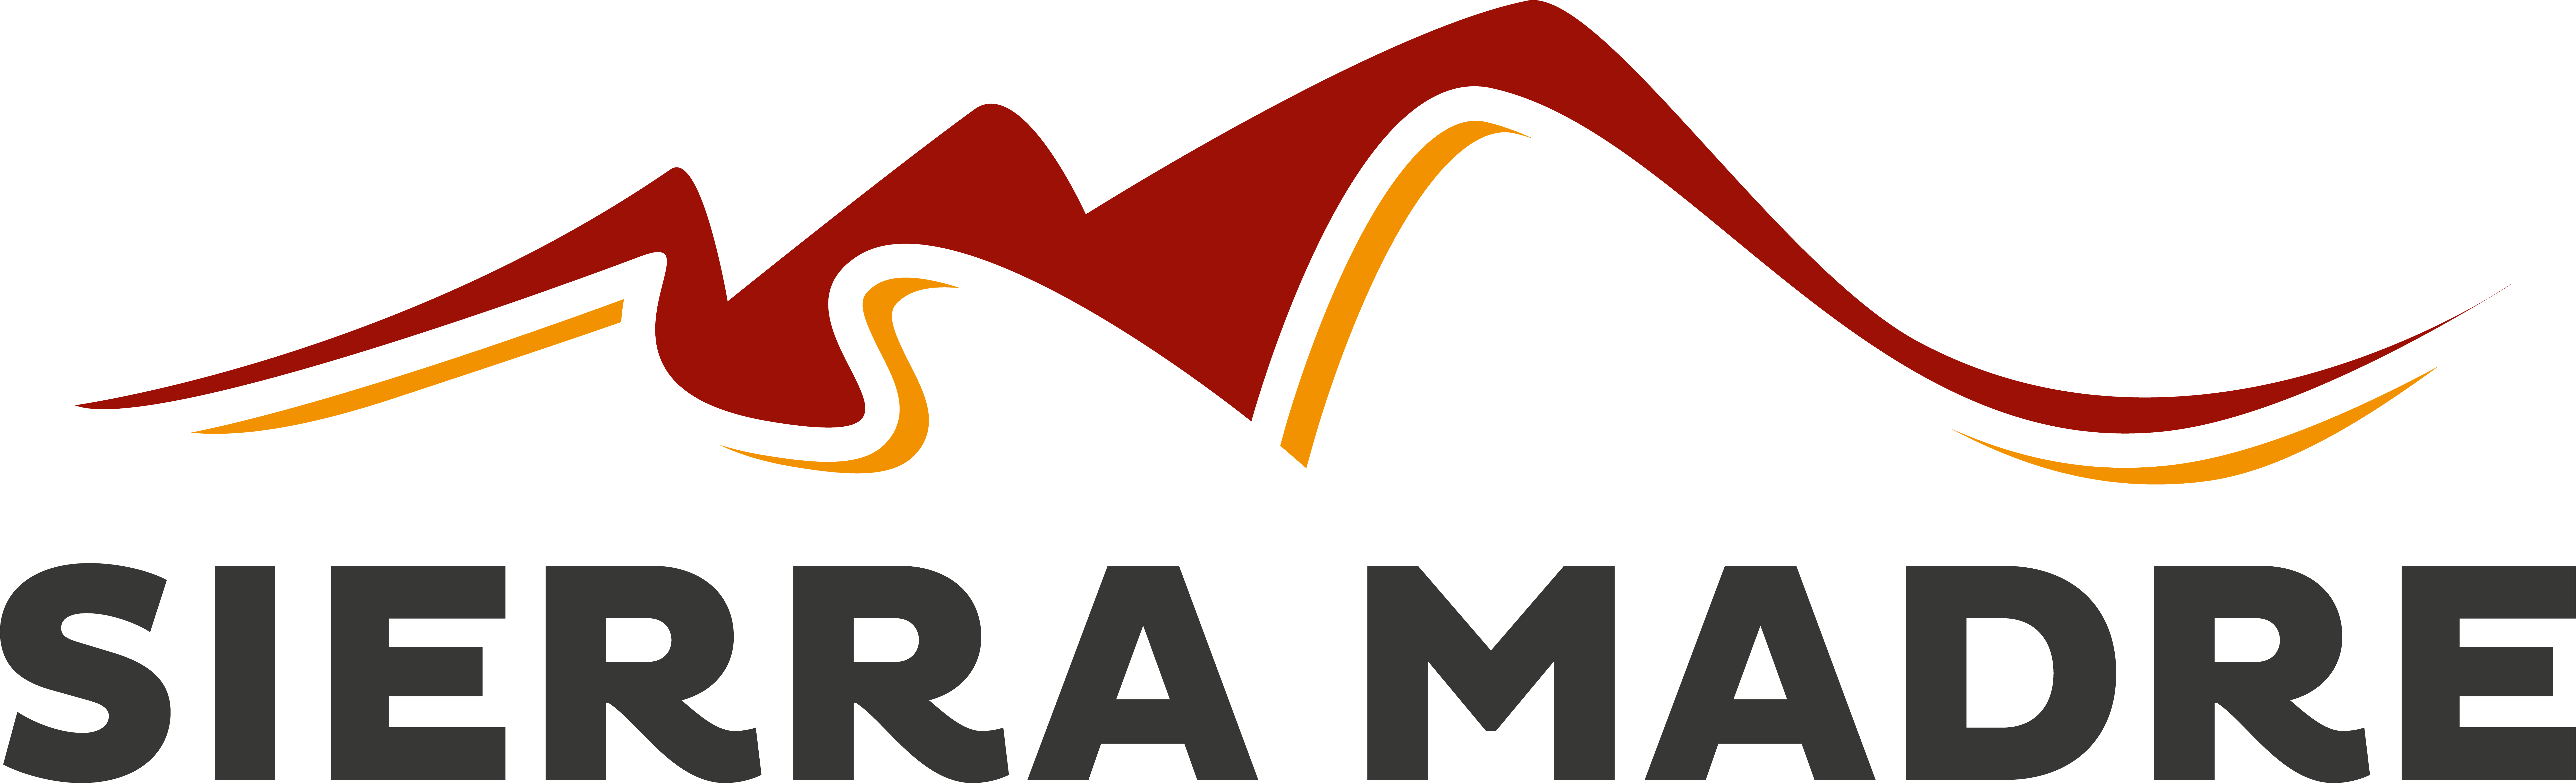 Sierra Madre GmbH